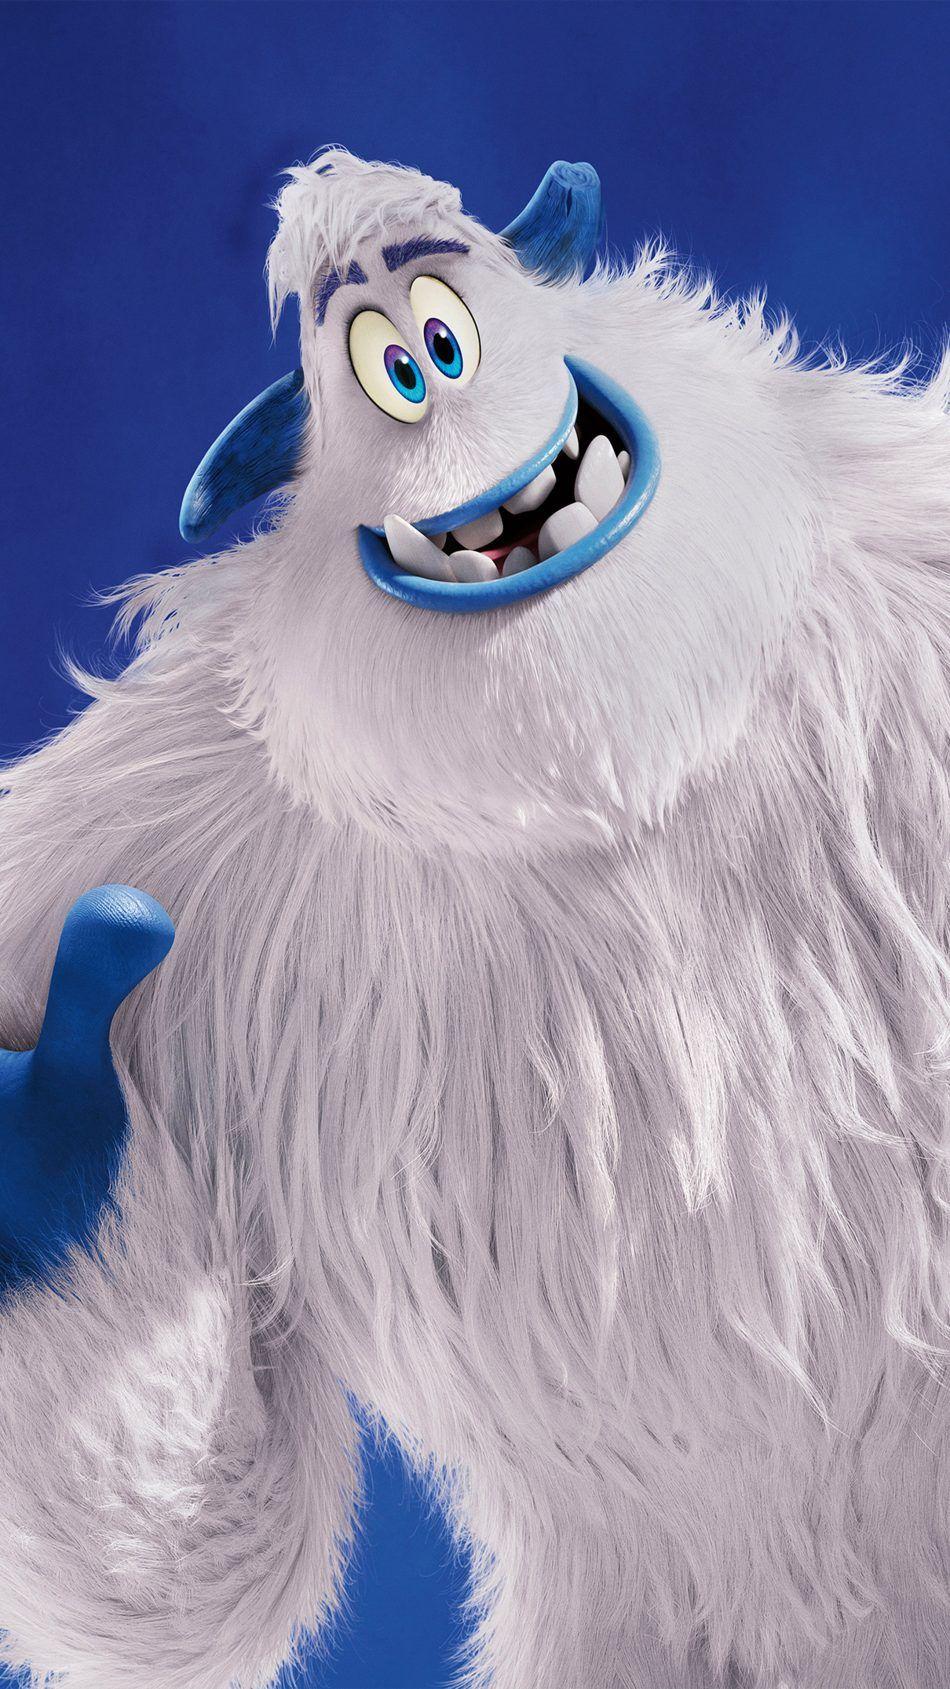 Channing Tatum As Migo Smallfoot 4k Ultra Hd Mobile Wallpaper Monster Characters Tv Animation Wallpaper